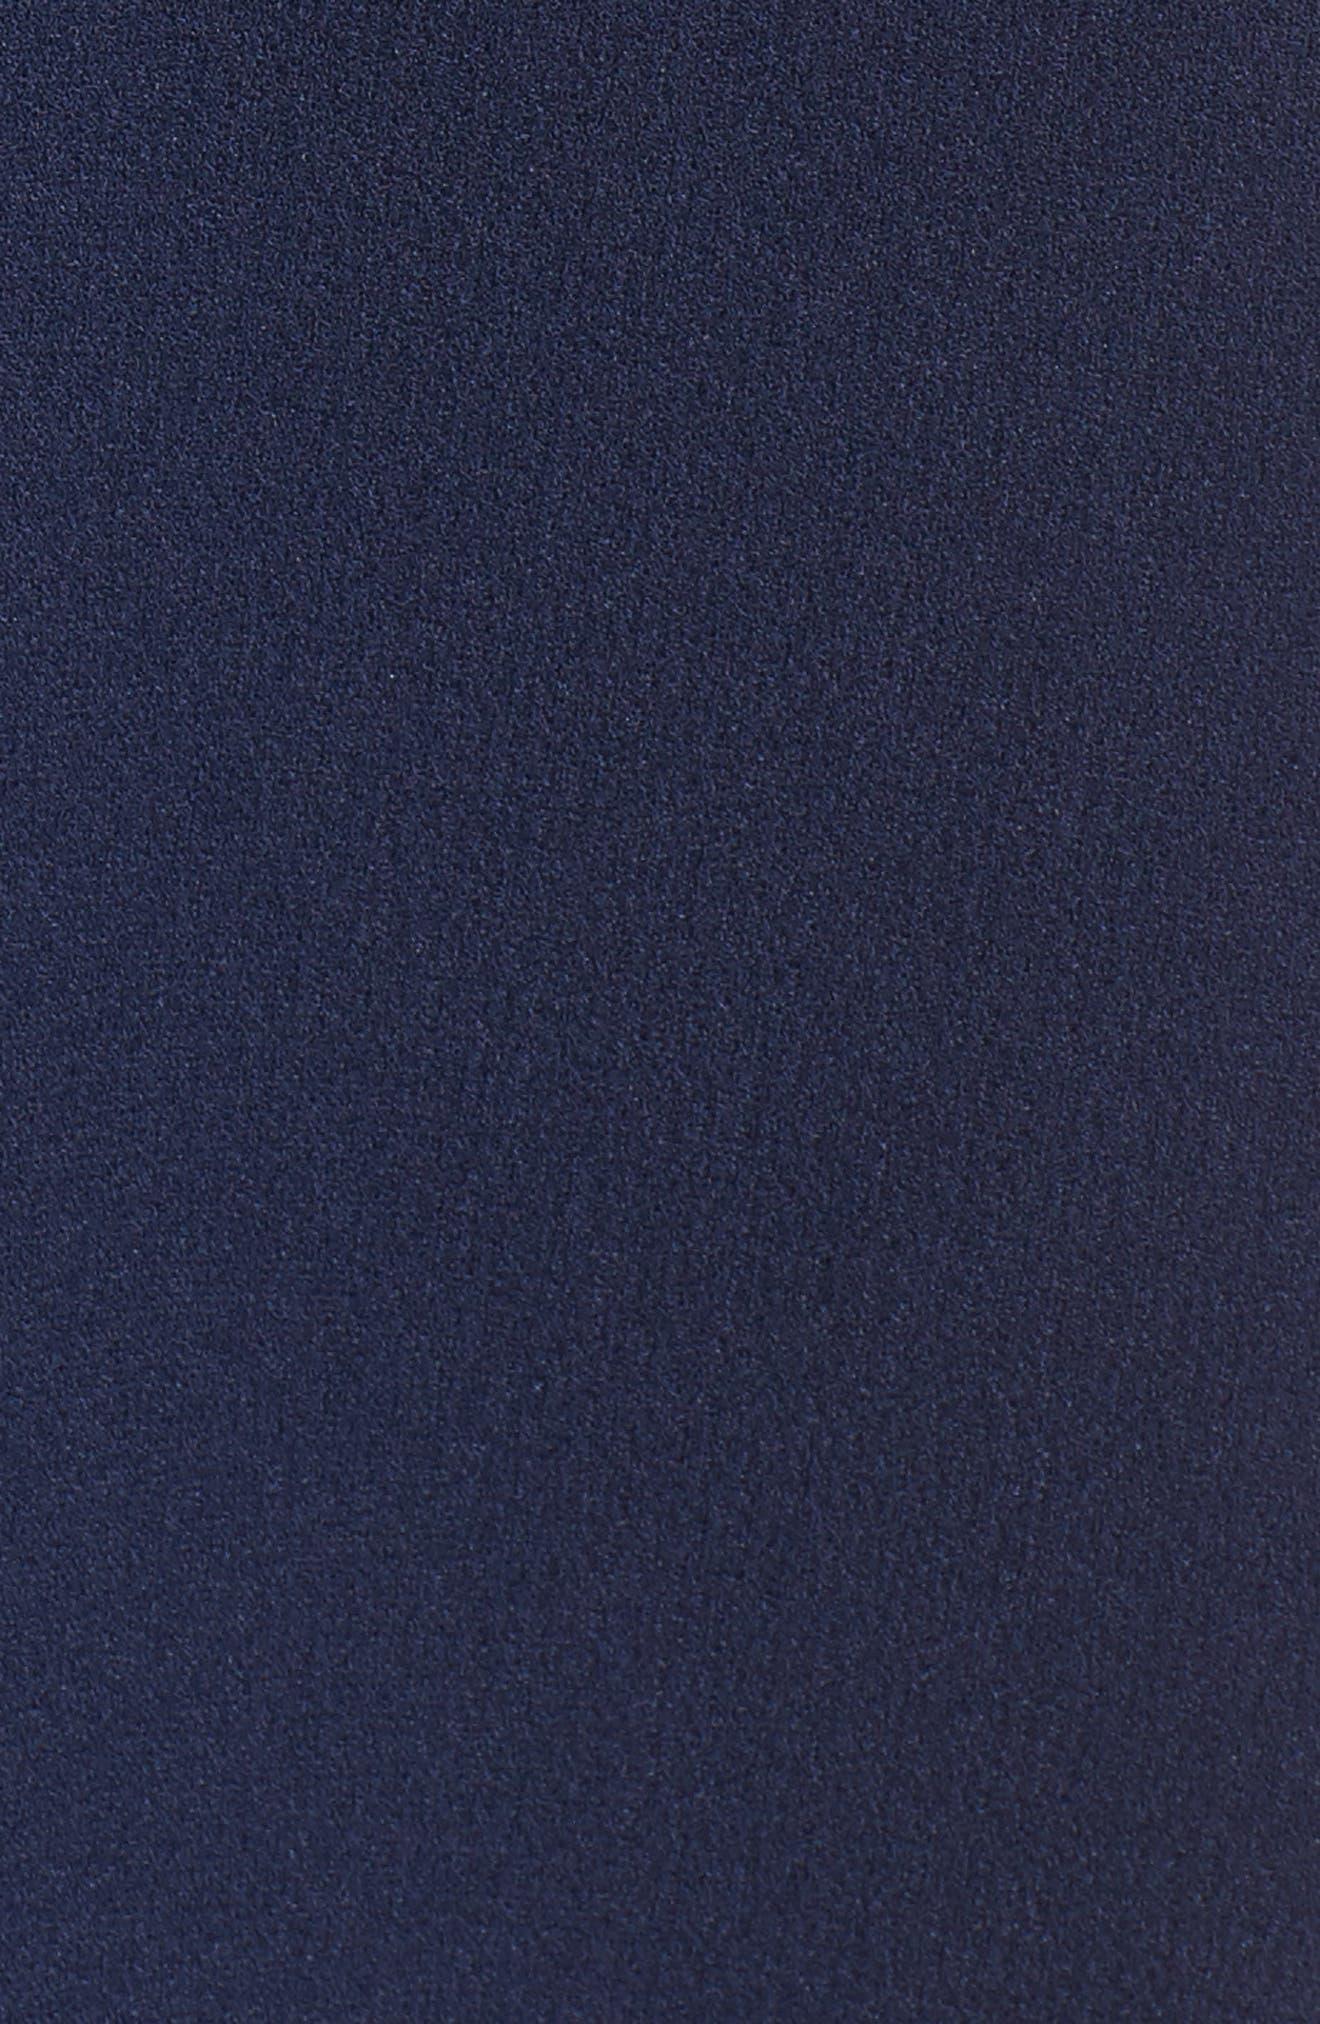 Hailey Crepe Dress,                             Alternate thumbnail 127, color,